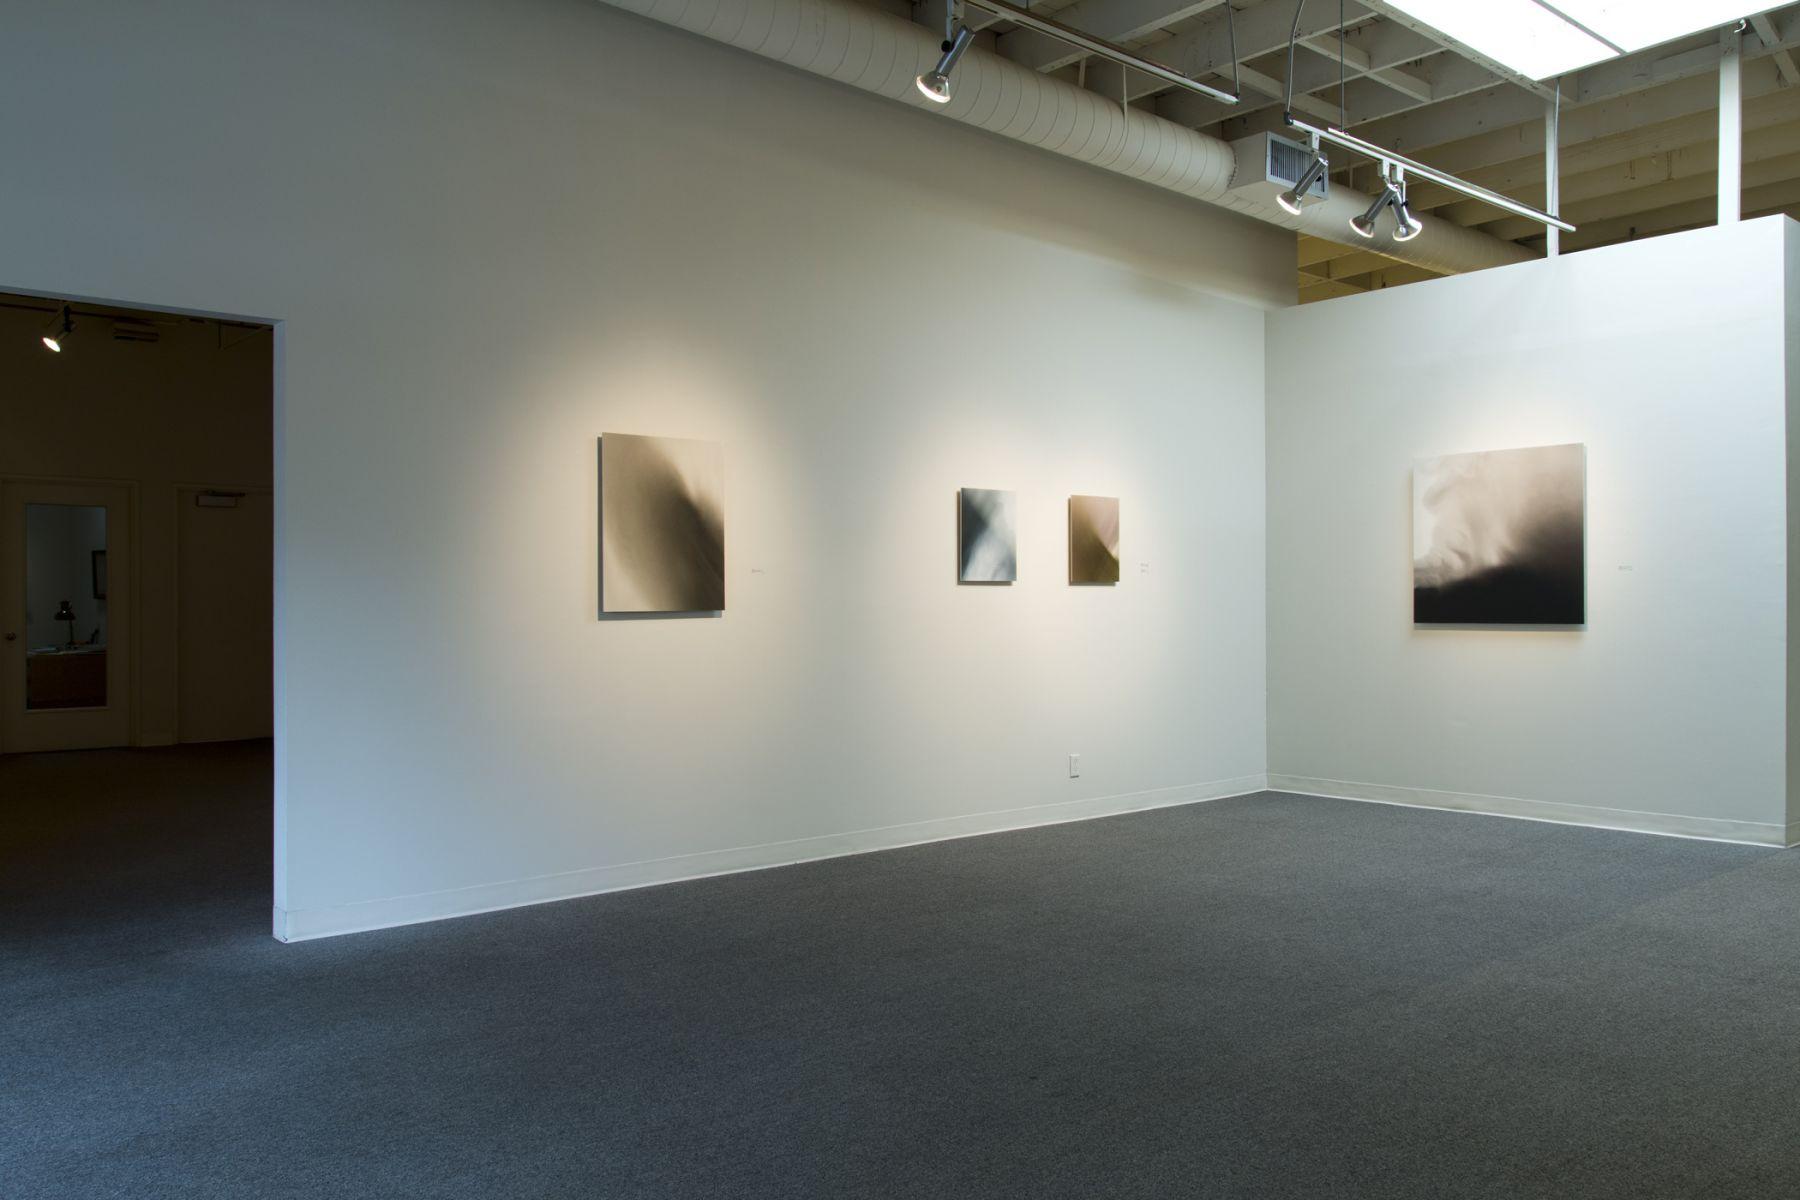 Joe Macca installation views at Laura Russo Gallery February 2015